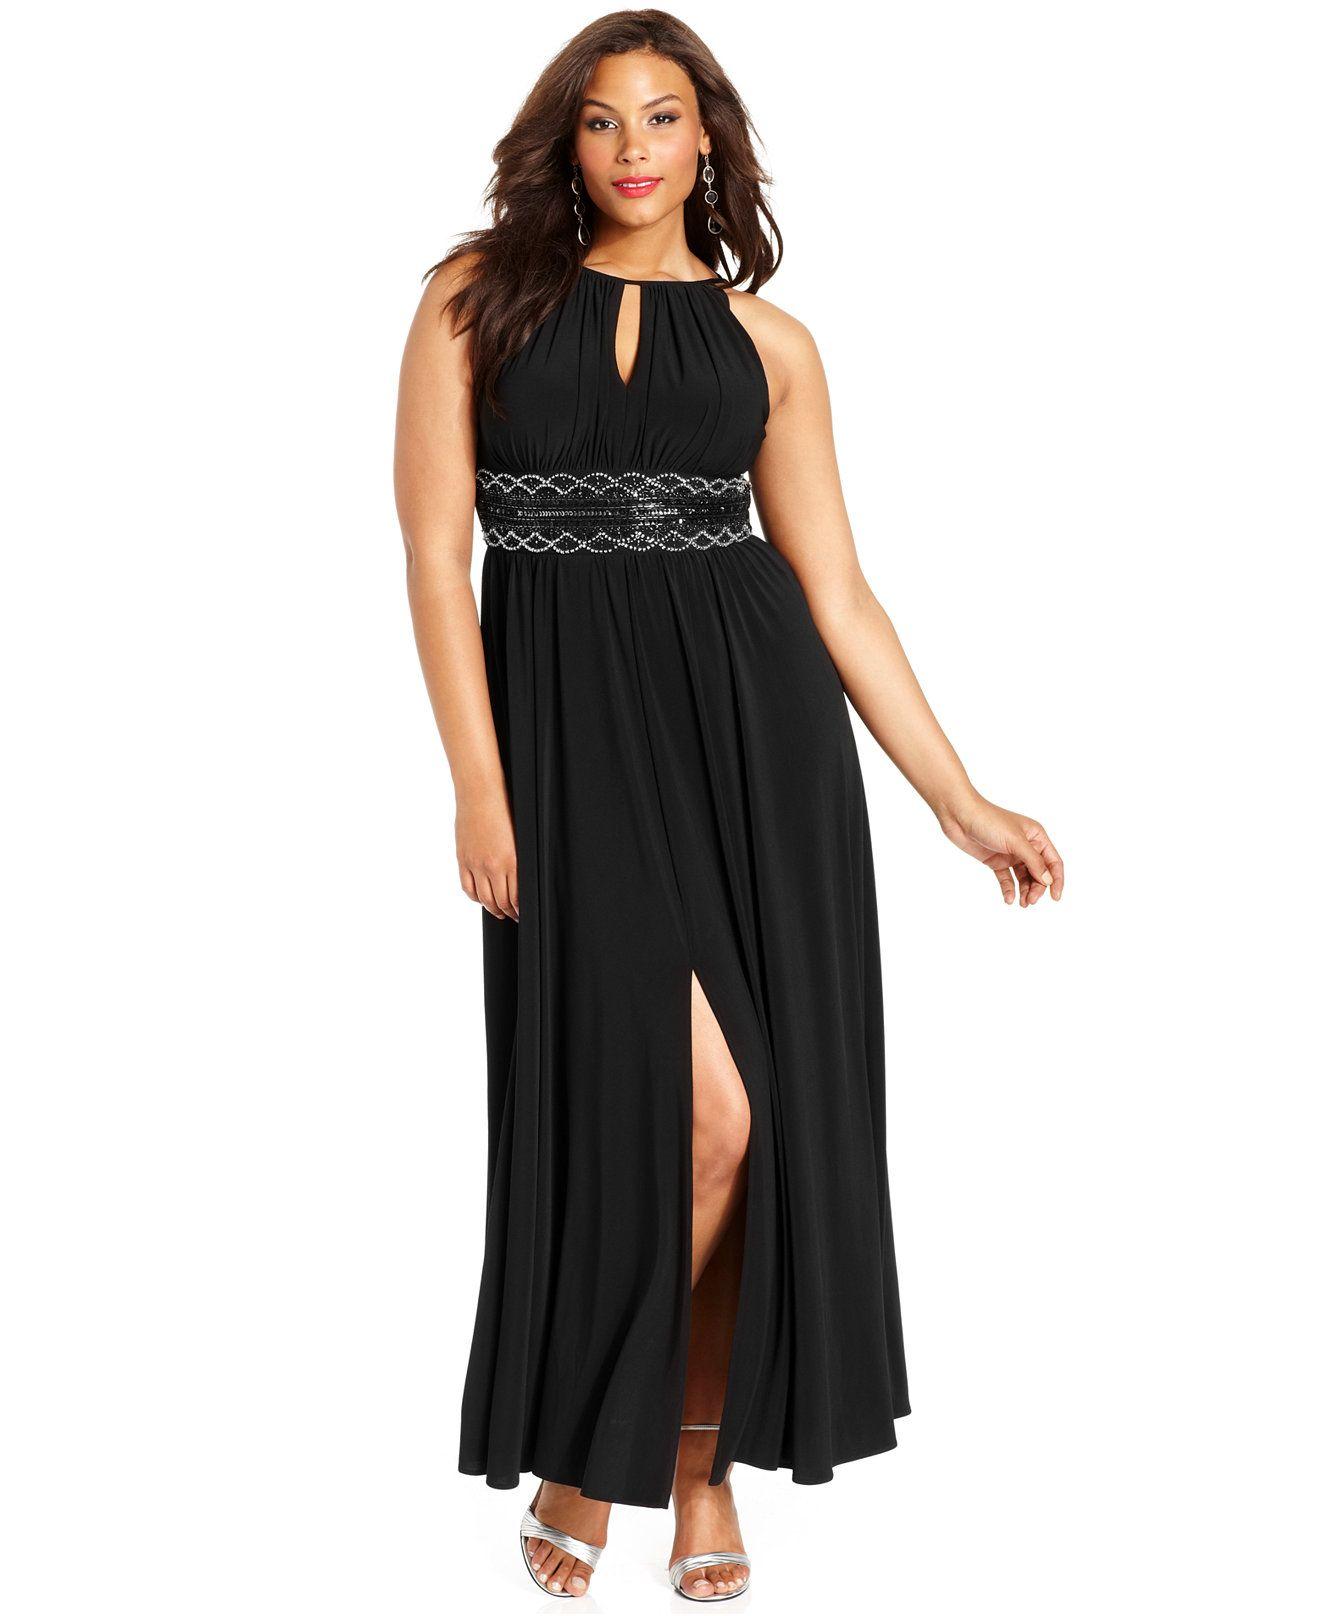 R&M Richards Plus Size Sleeveless Beaded Gown | Curvy Genius ...